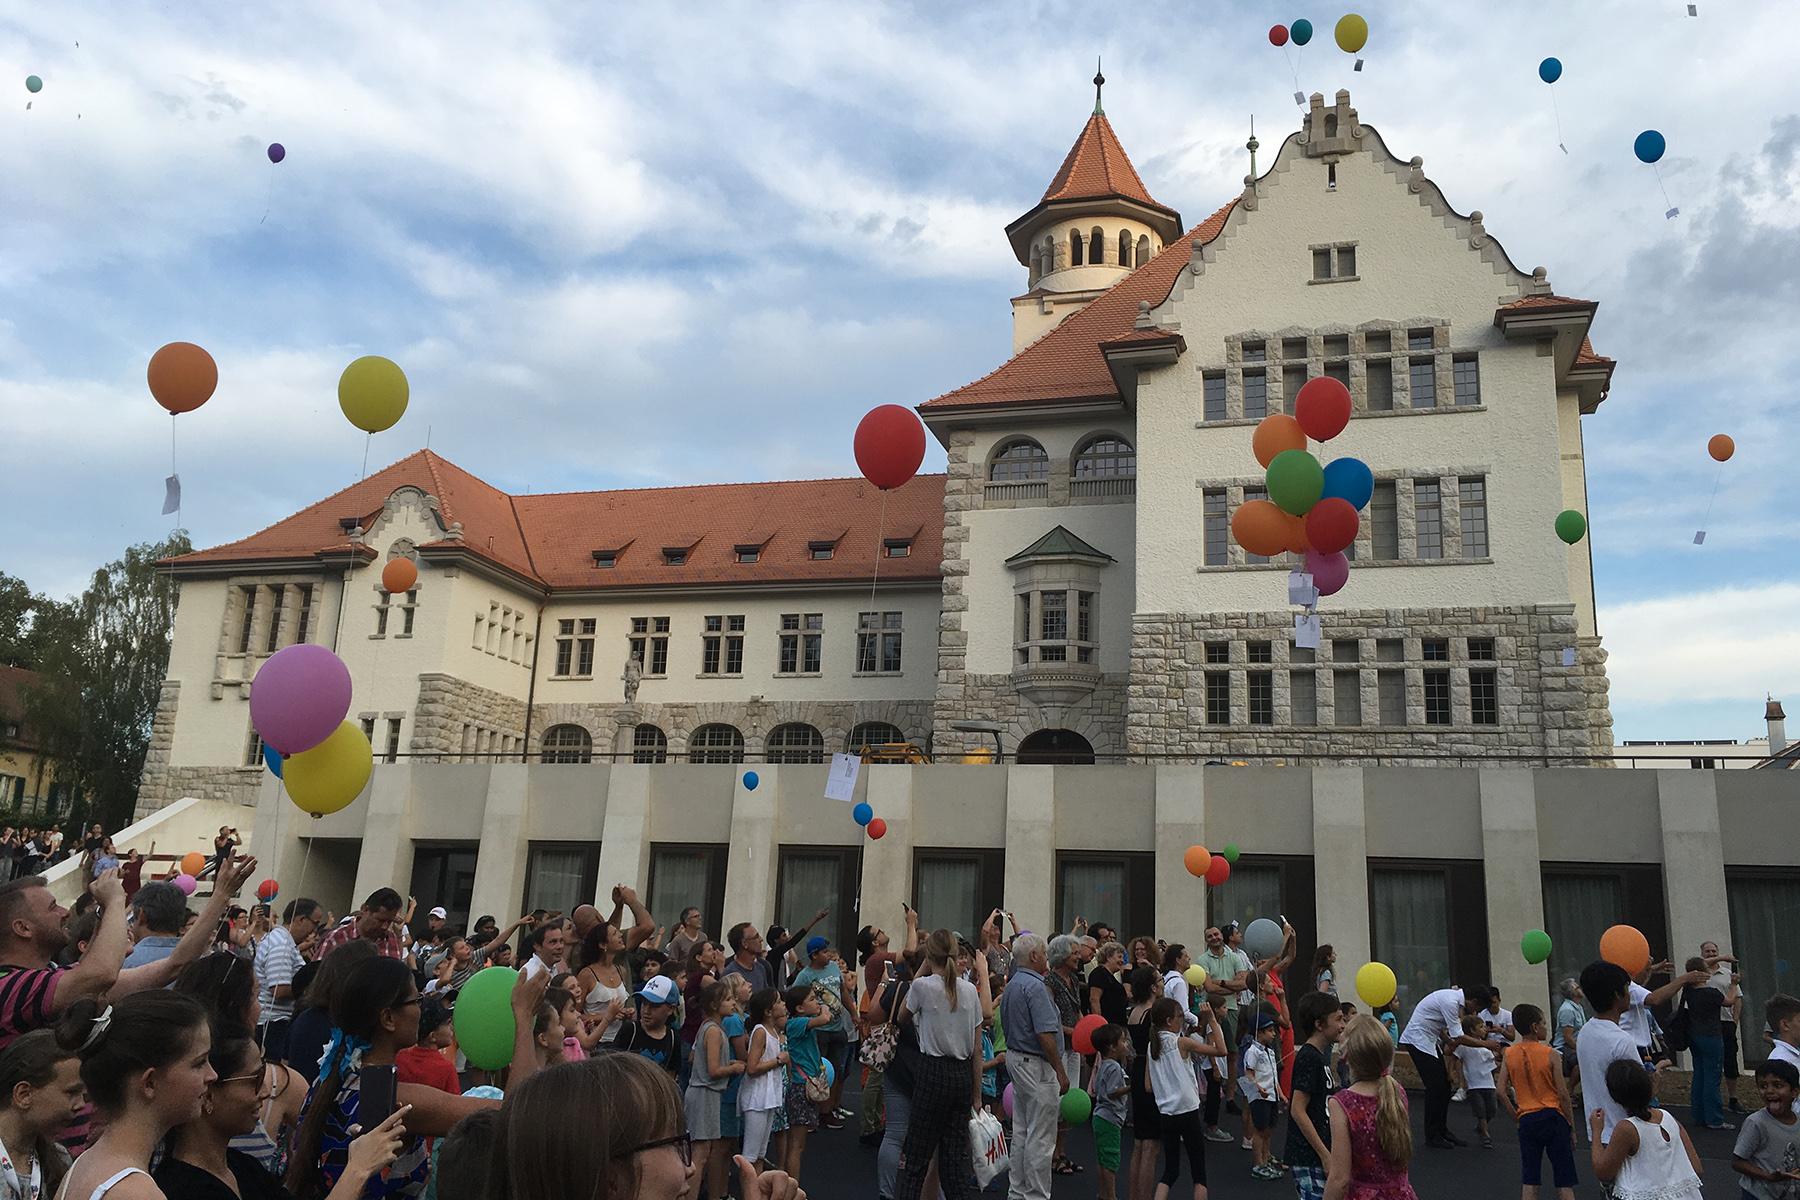 Jugendfest at a school in Brugg